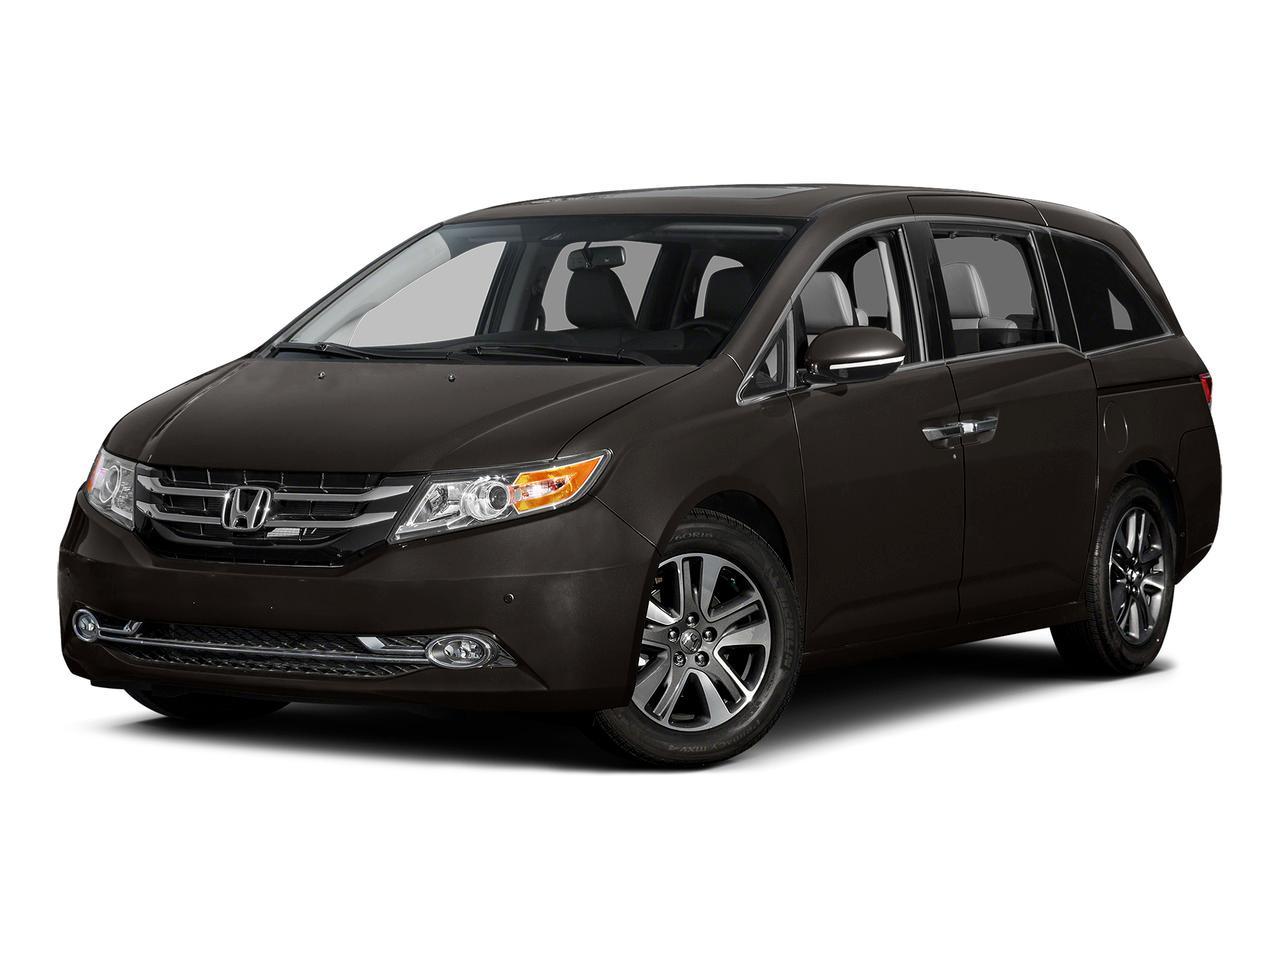 2015 Honda Odyssey Vehicle Photo in Carlisle, PA 17015